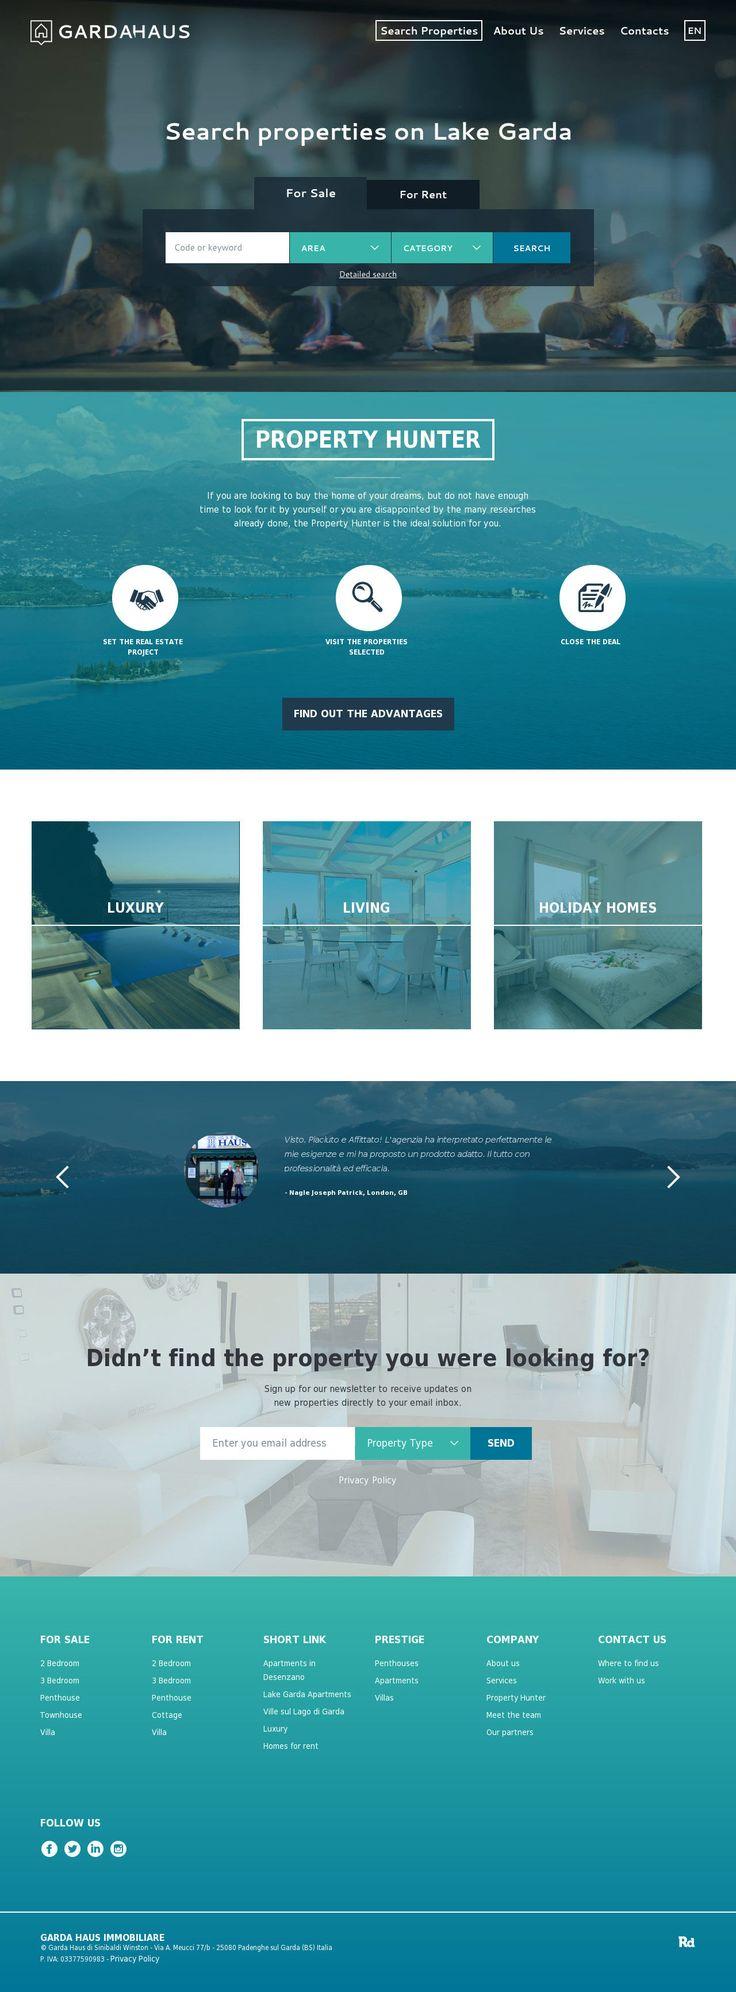 7 best bruce schneier images on pinterest authors foundation full css web design inspiration garda haus fandeluxe Images